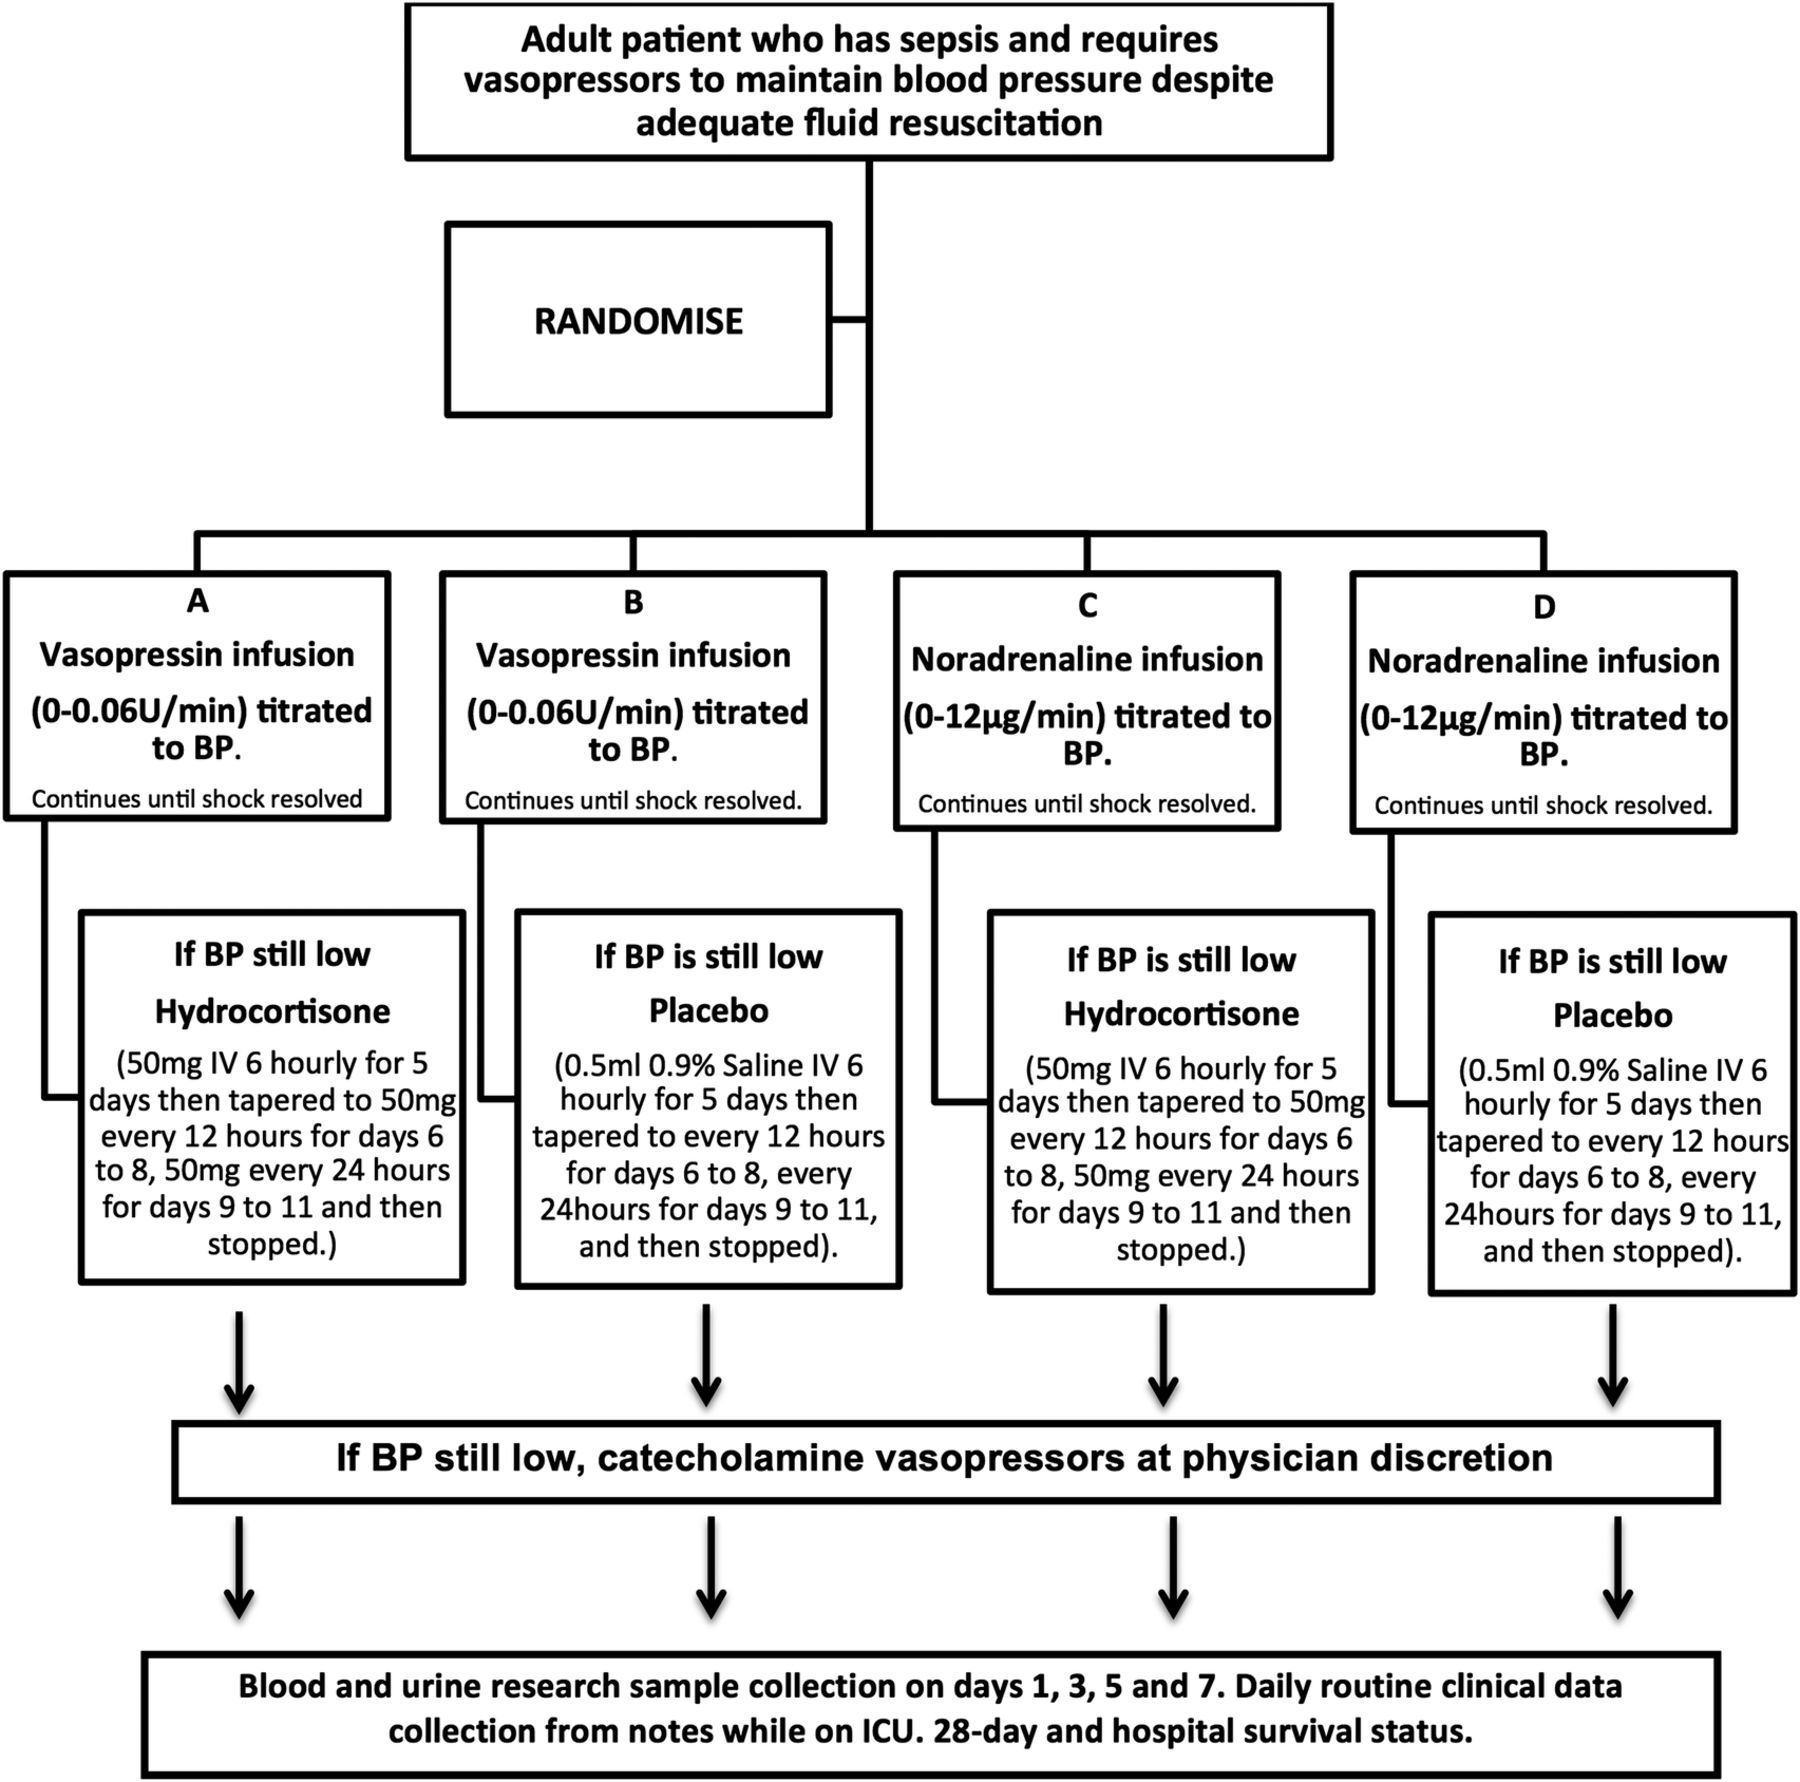 Protocol for a randomised controlled trial of VAsopressin versus